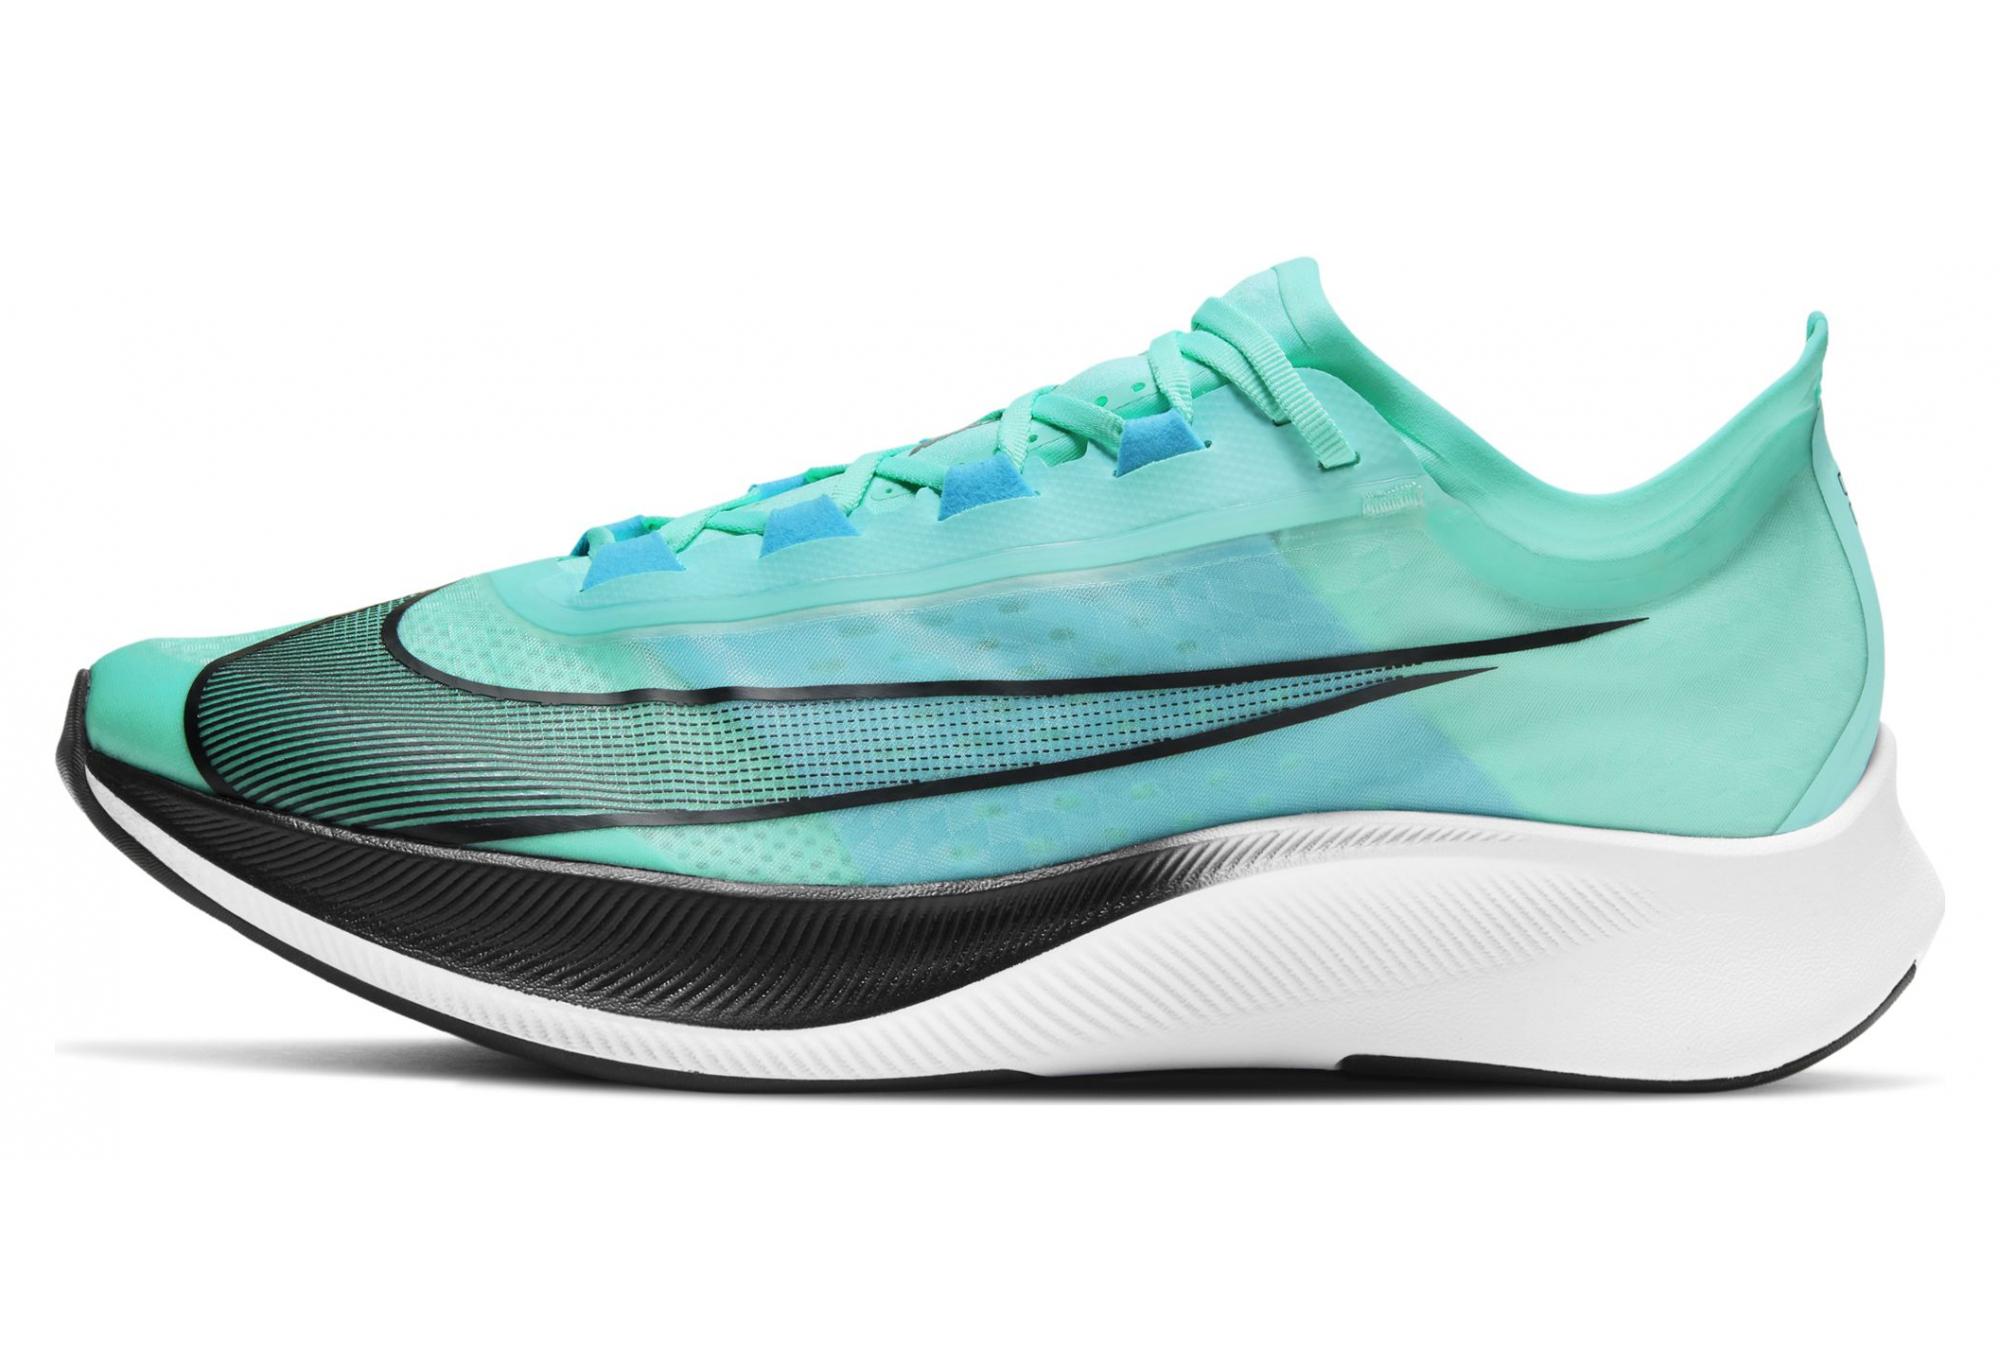 Nike Zoom Fly 3 Running Shoes Green Black Men